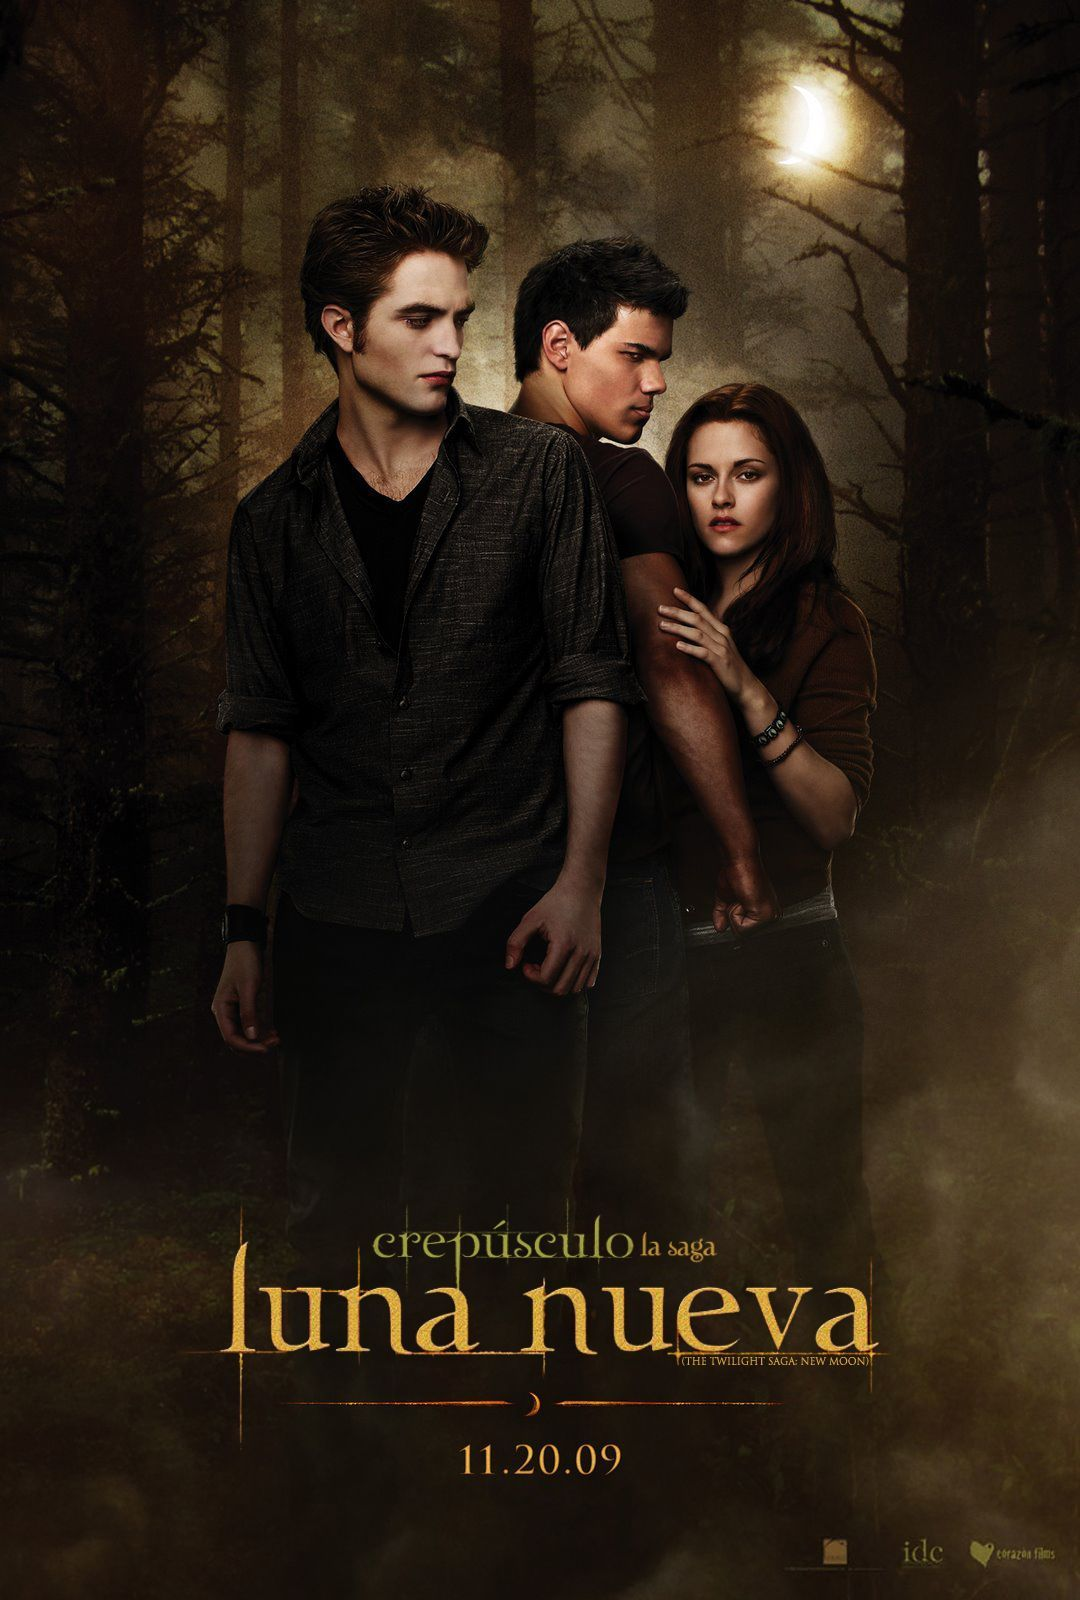 Pin De Carmen Manriquez En Movies Crepusculo Pelicula Completa Crepusculo Pelicula The Twilight Saga New Moon